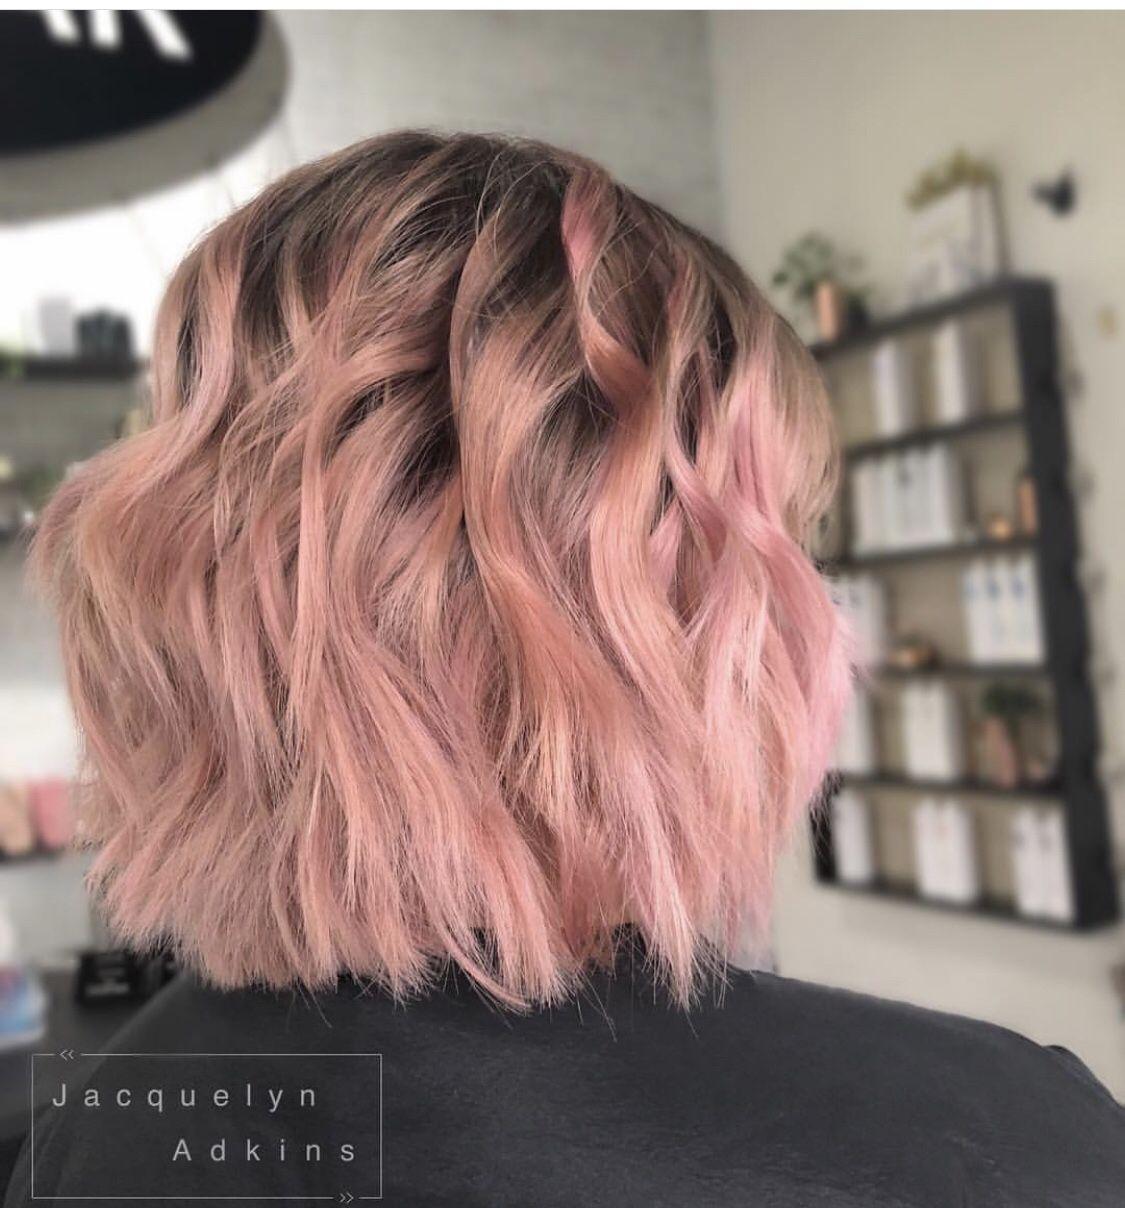 Follow Me On Instagram Unevneib Dark Root Pink Ends Hair Short Hair Rose Hair Rose Gold Wavy Hair Wand Curls Pink Short Hair Light Pink Hair Short Hair Styles